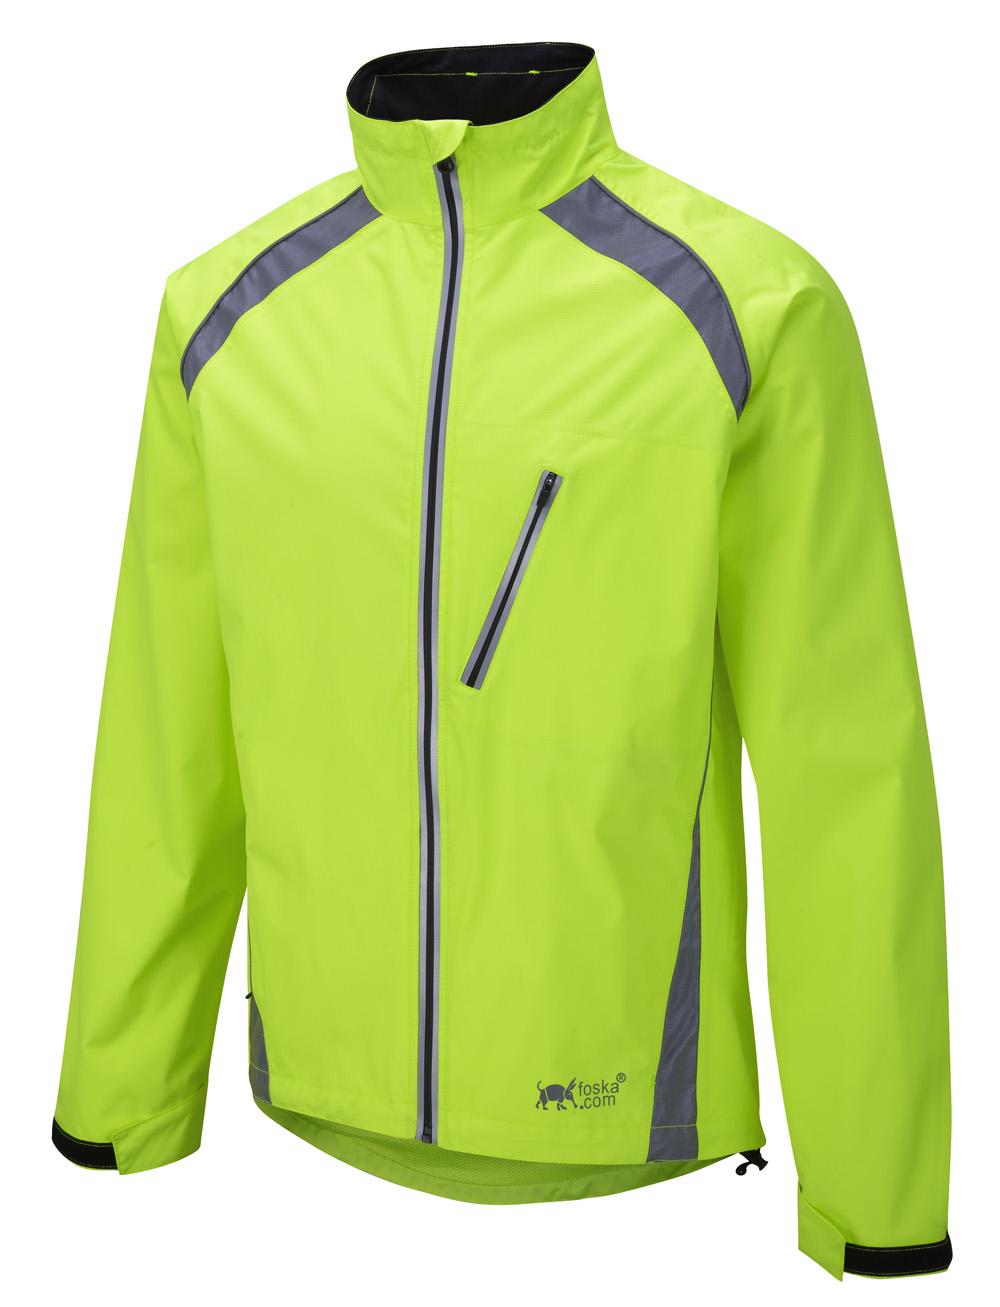 Oska Hi-Vis Waterproof Cycling Jacket - Yellow ... f8b14d5b2